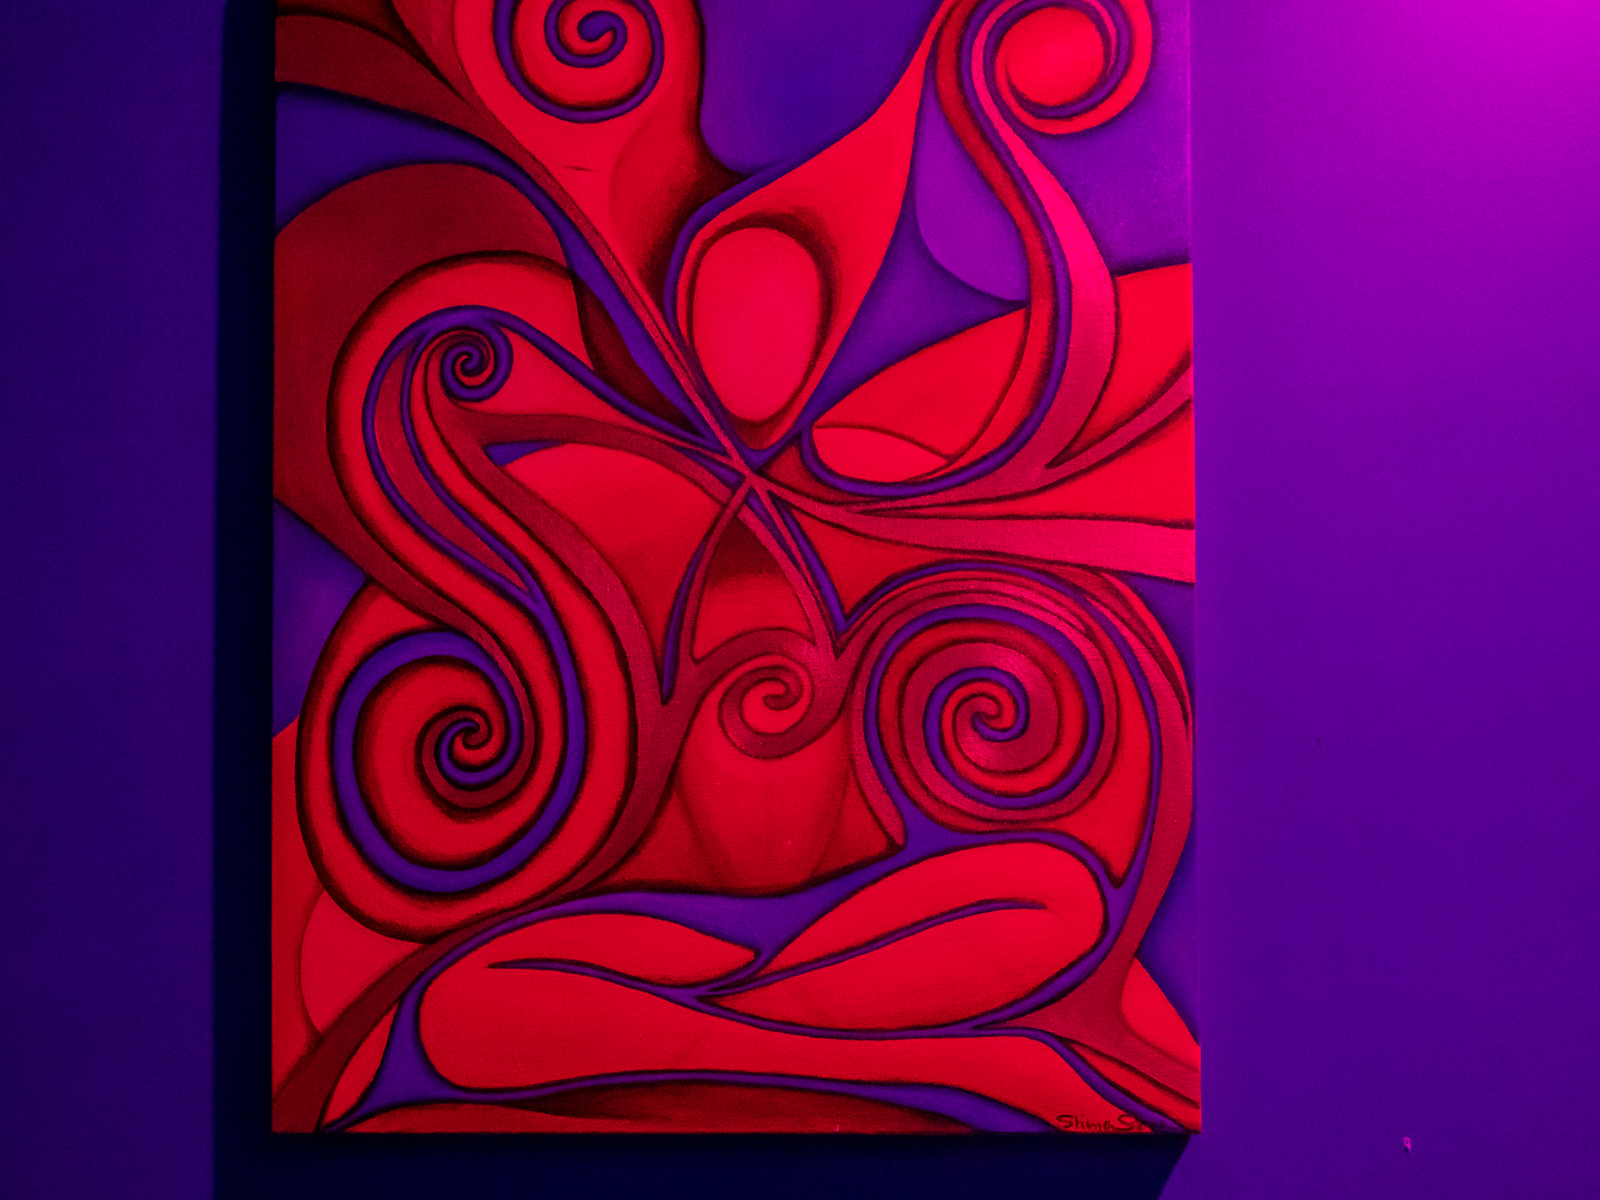 Red Artwork Photo